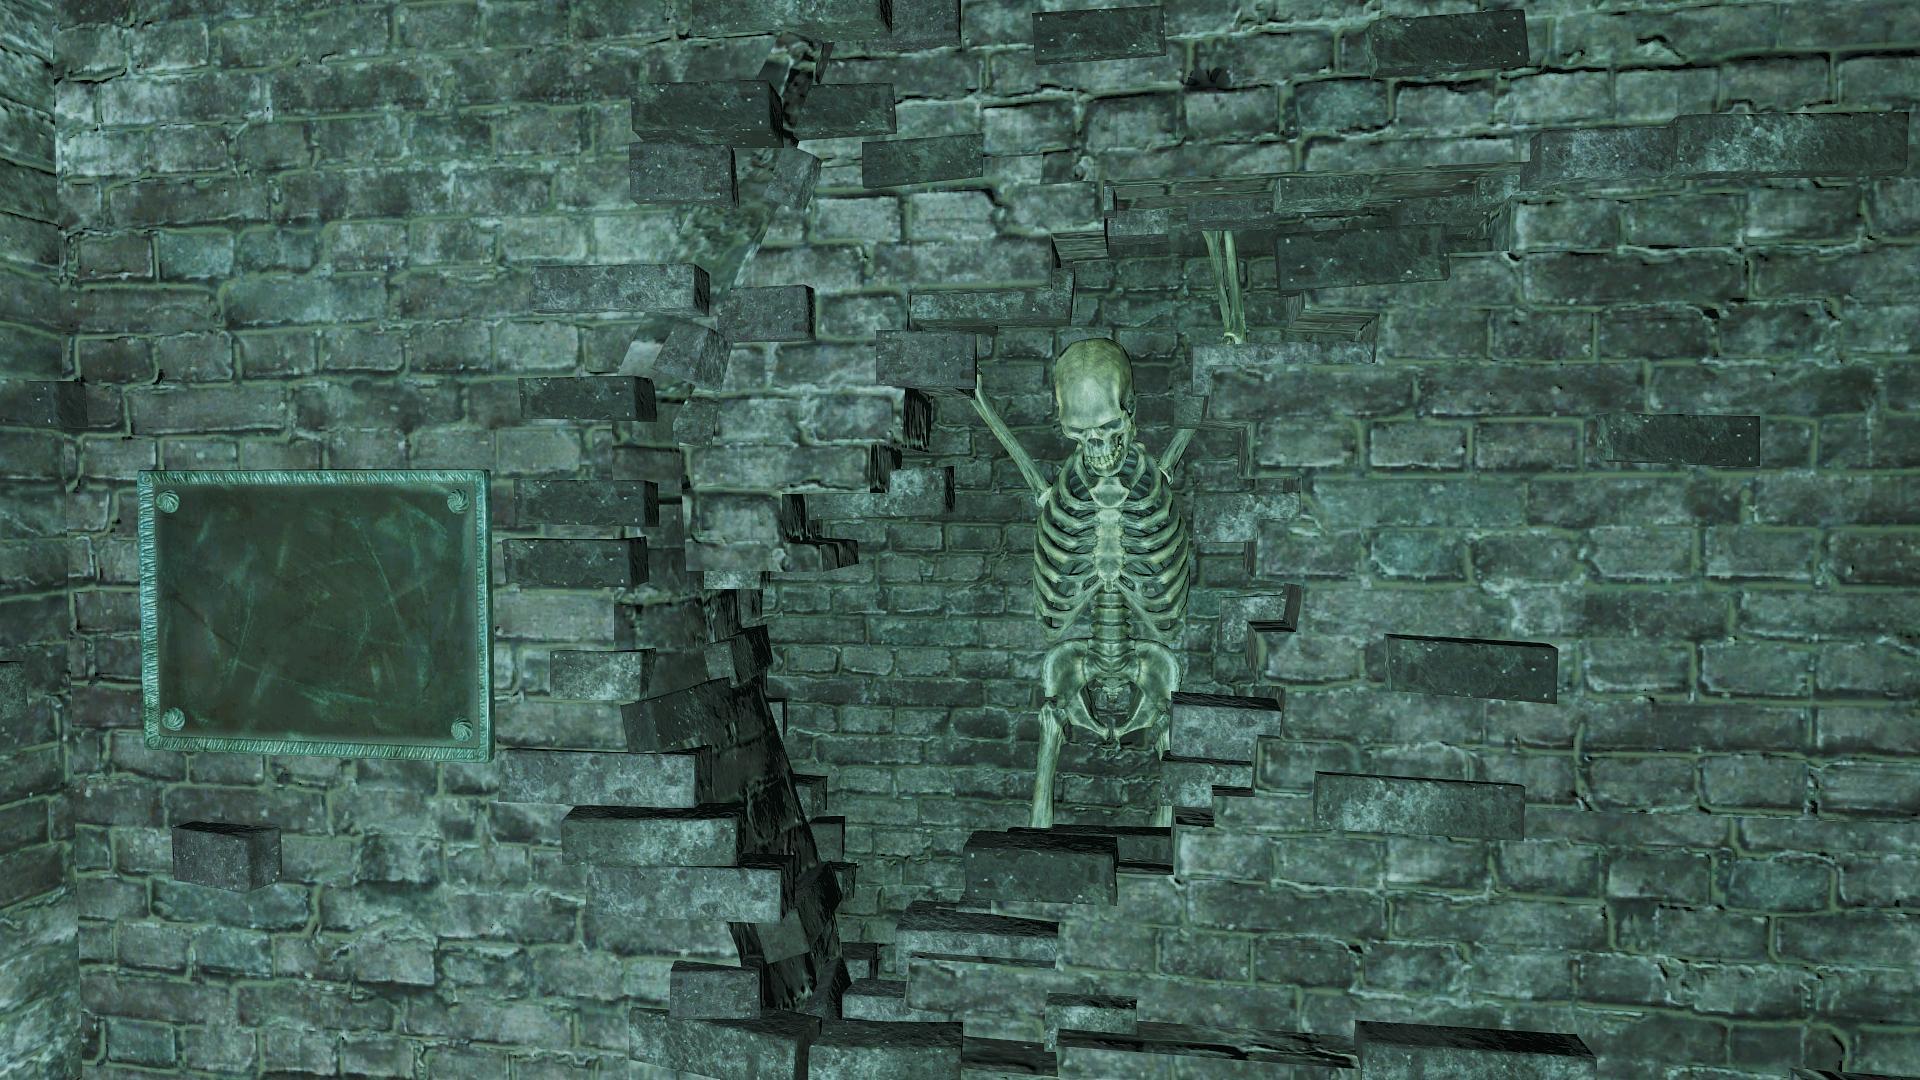 000180.Jpg - Fallout 4